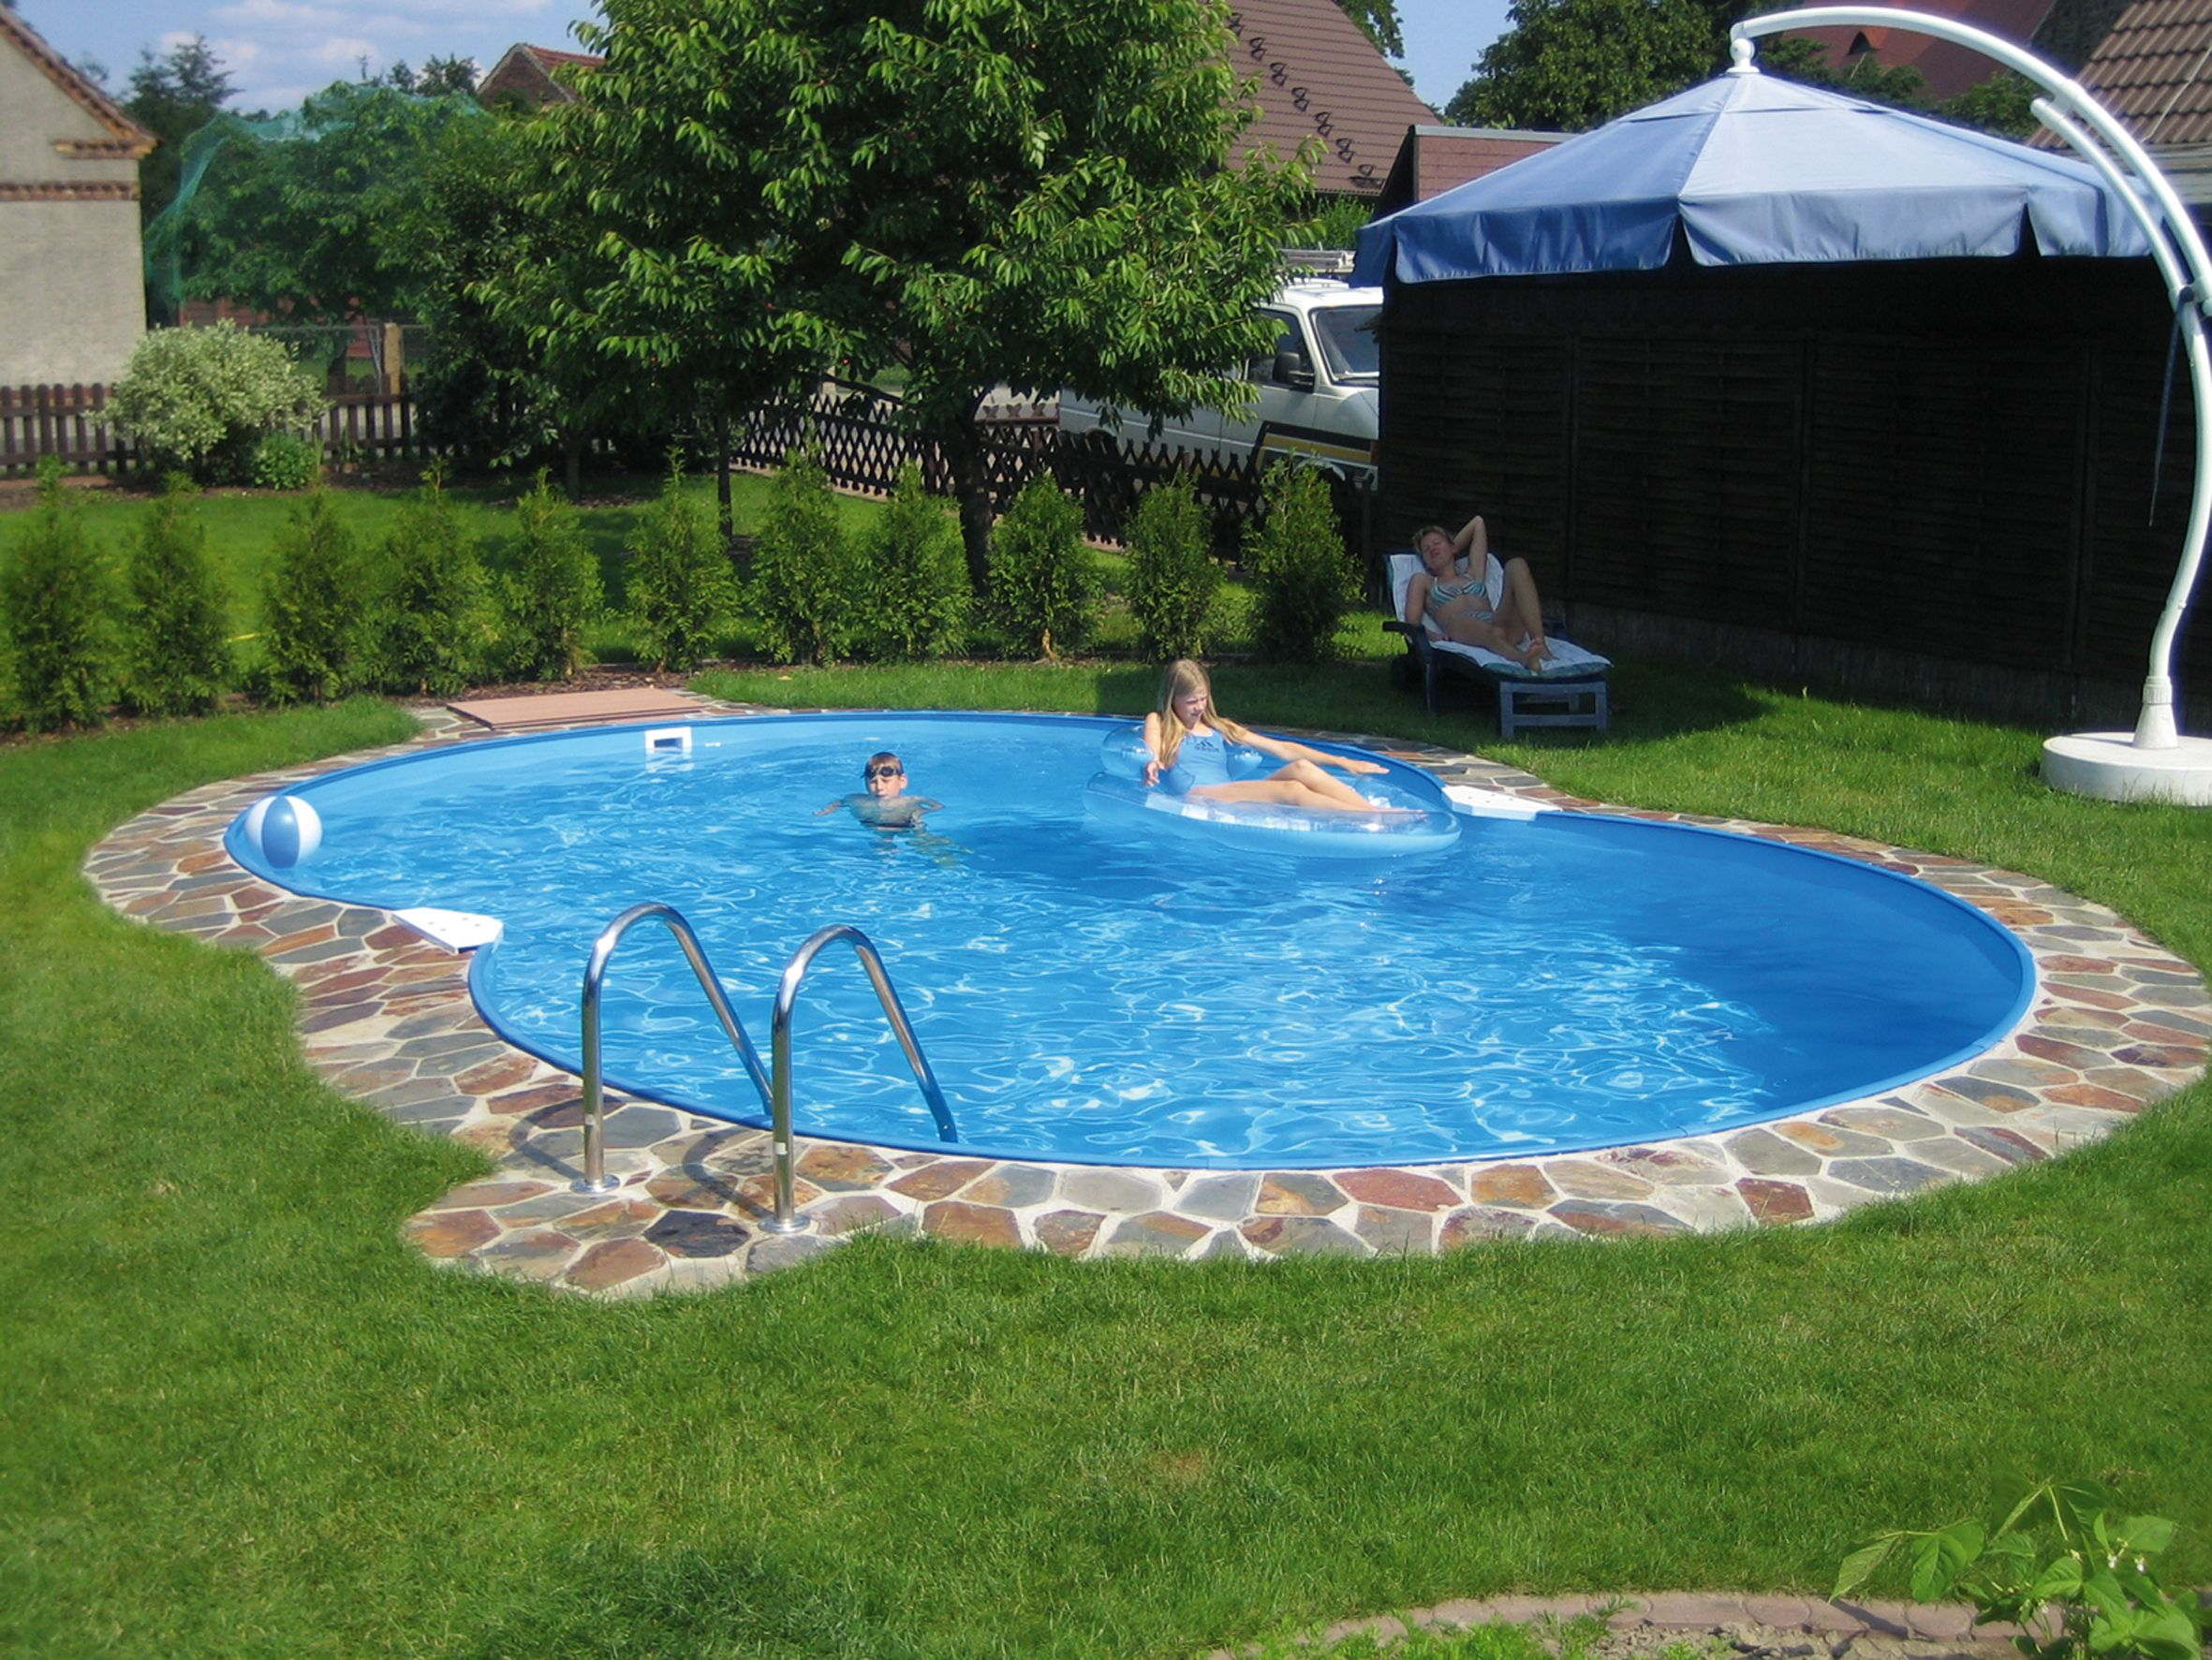 Backyard Landscaping Ideas Swimming Pool Design Homesthetics Inspiring Ideas For Your Ho Swimming Pools Backyard Backyard Pool Designs Small Swimming Pools